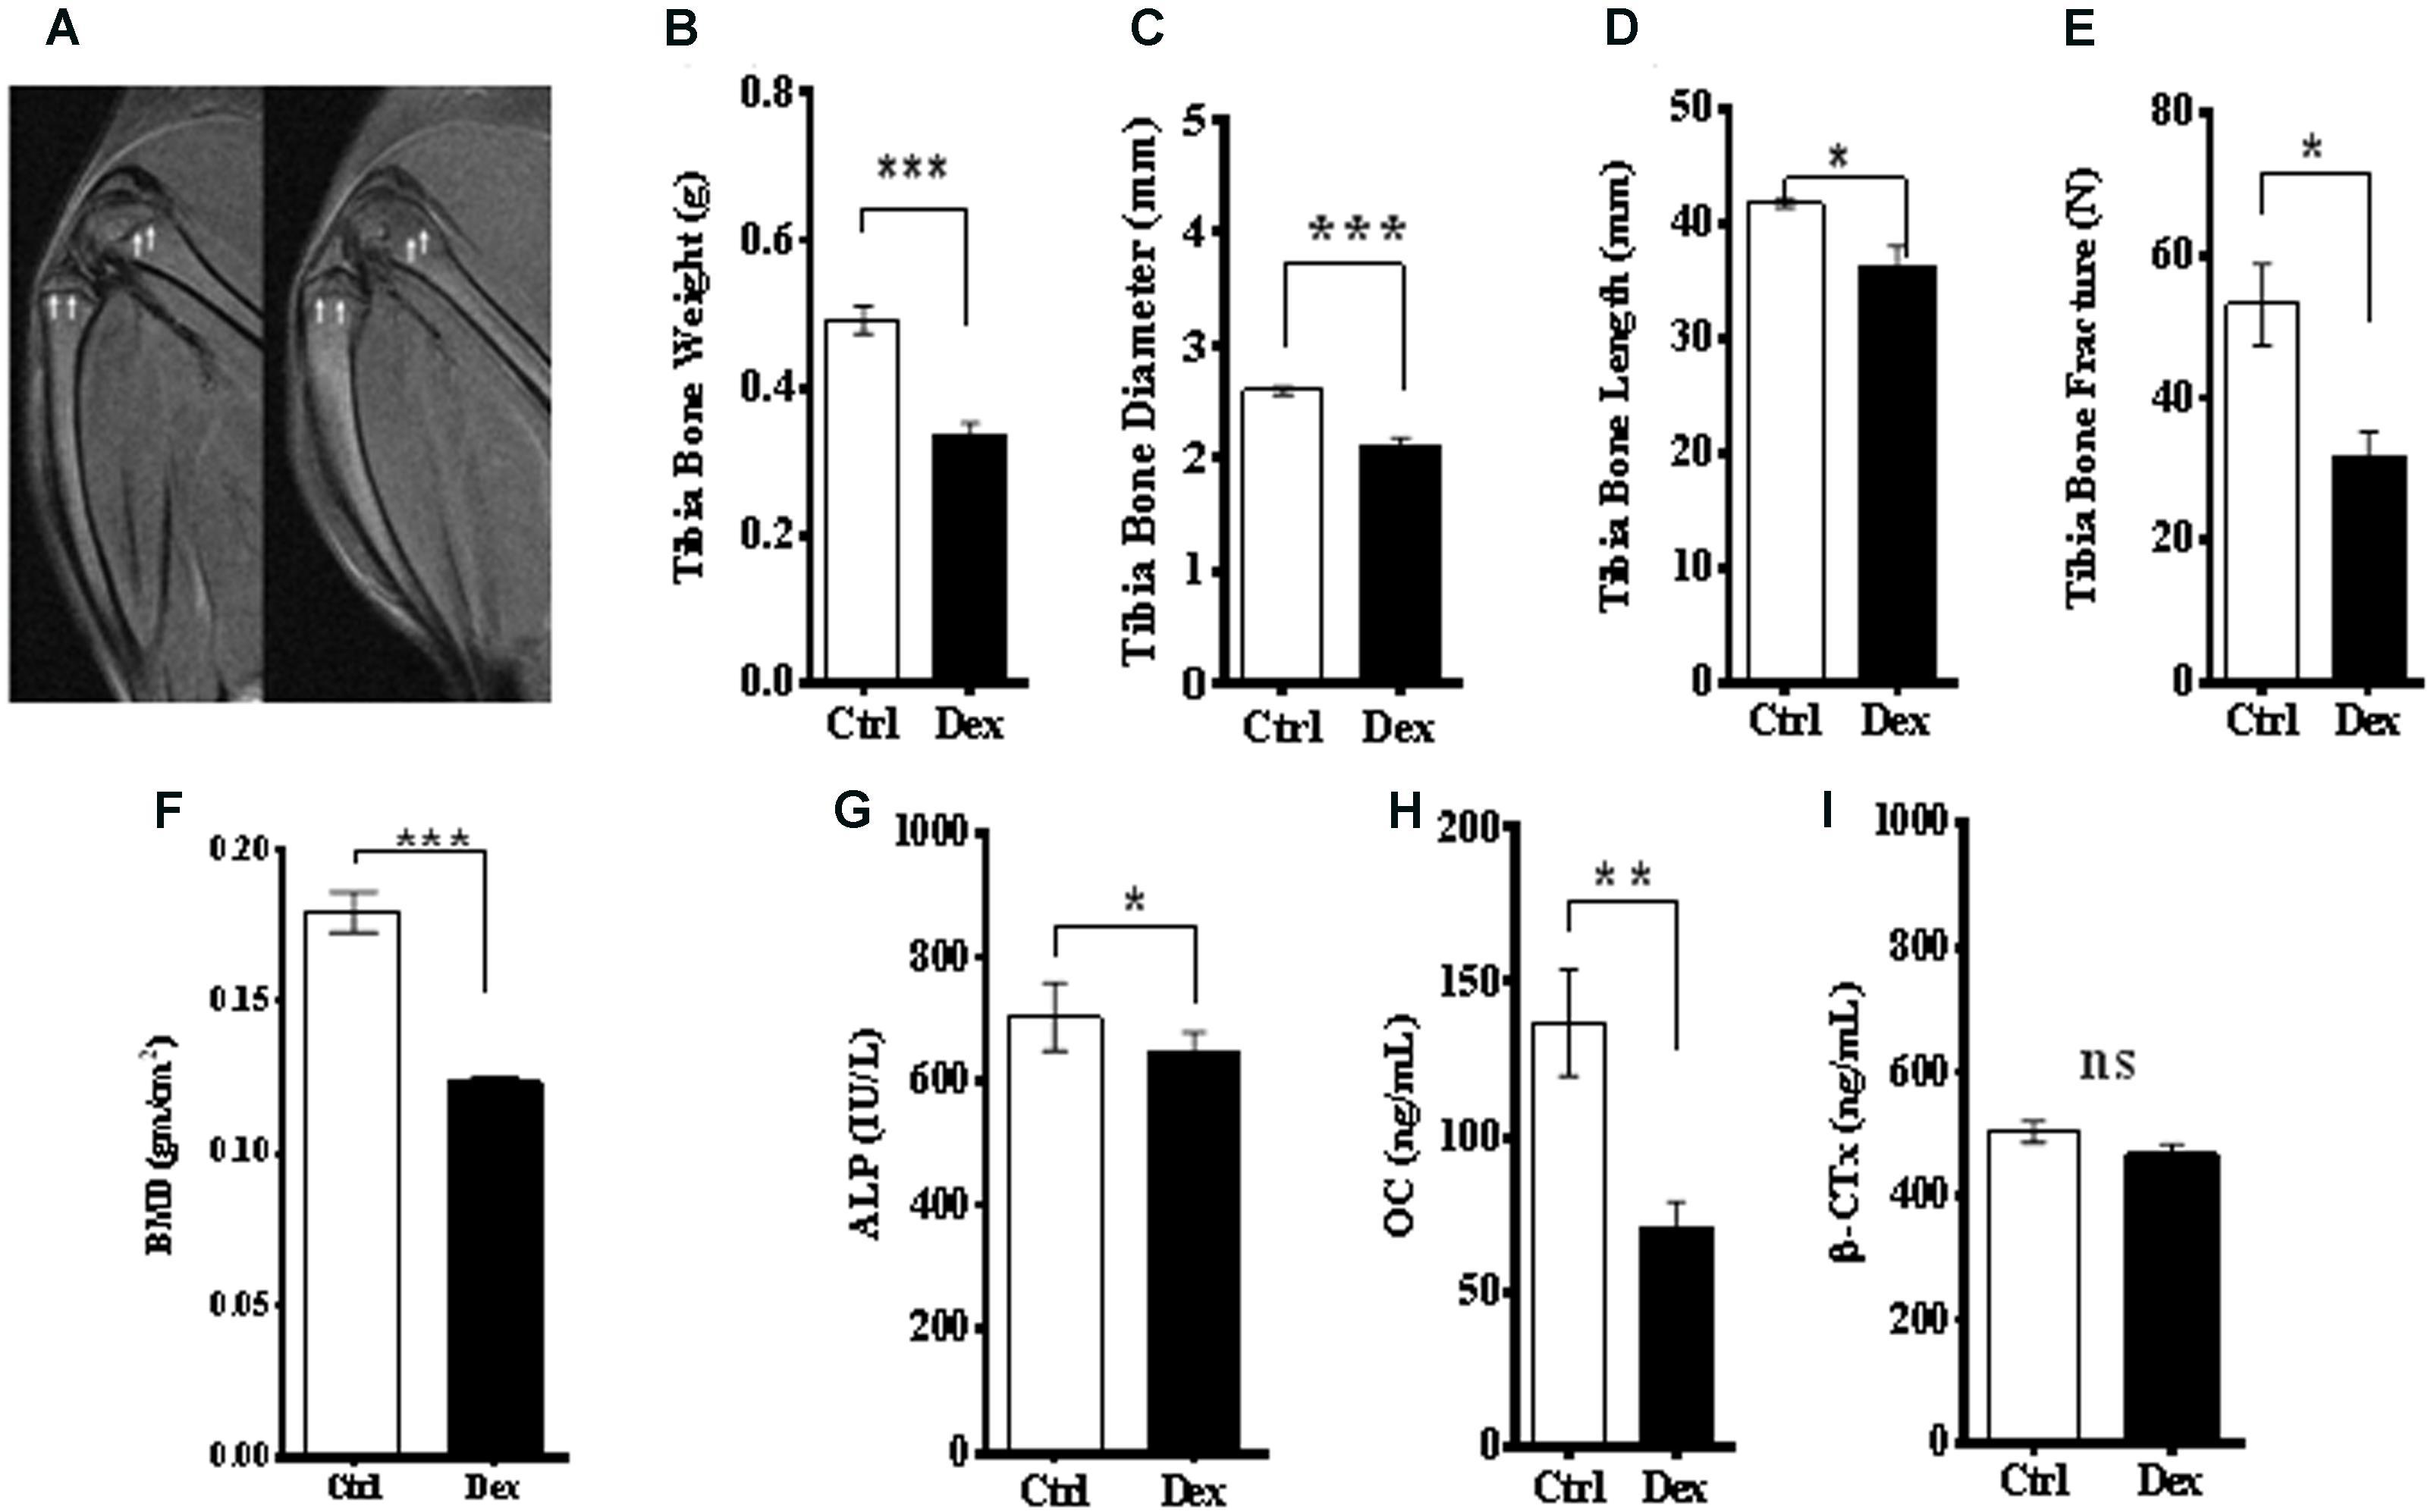 Frontiers Metabolomics Based Profiling Of Dexamethasone